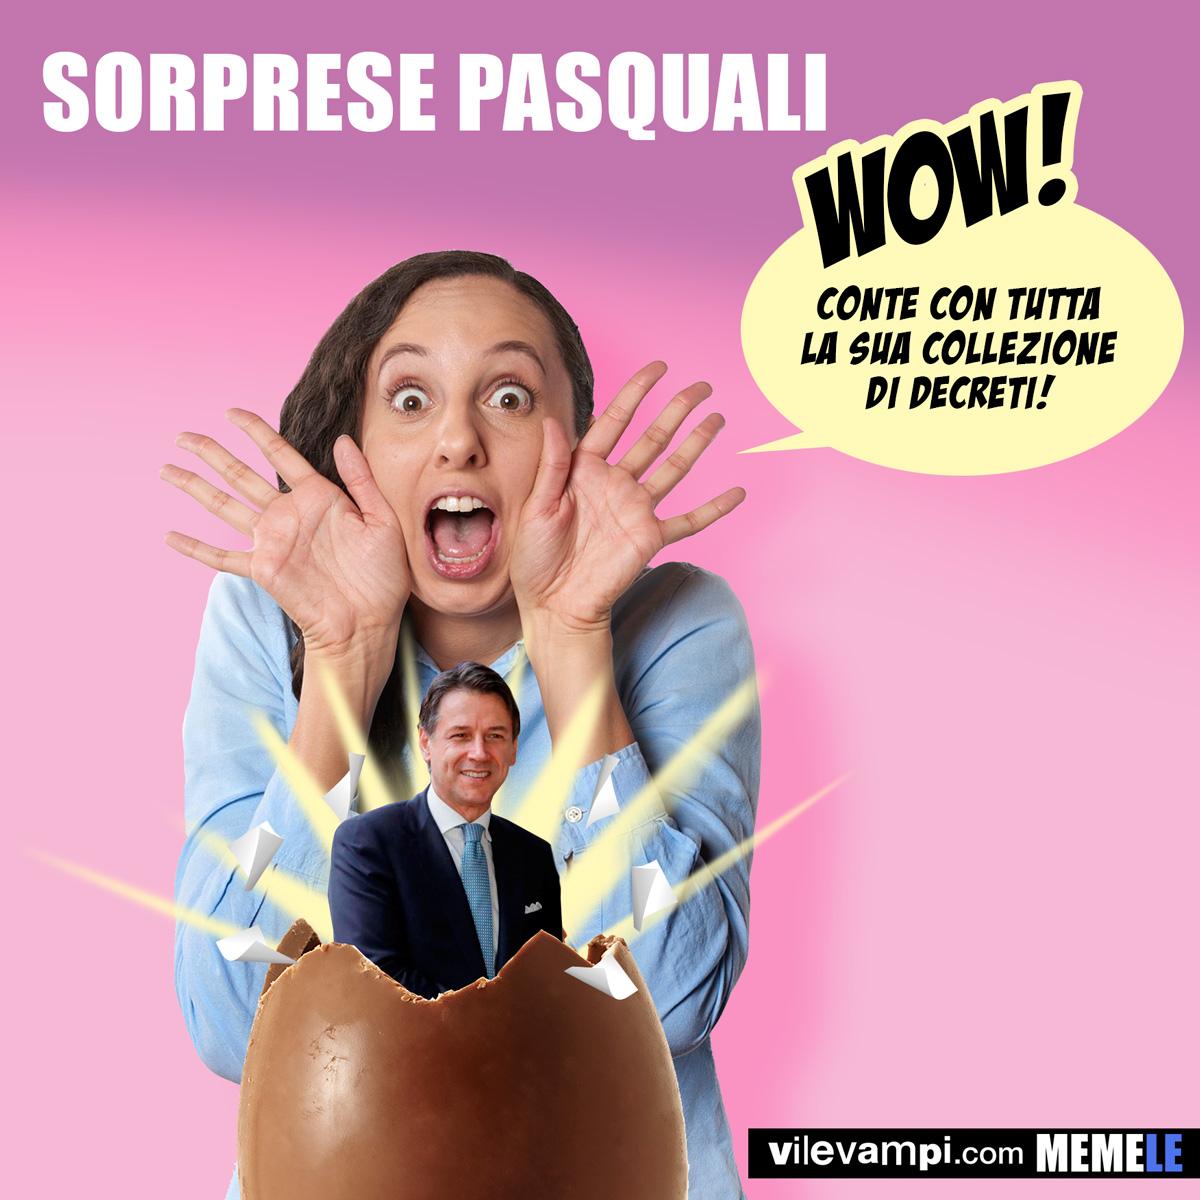 2020_Meme_Pasqua-sorpresa